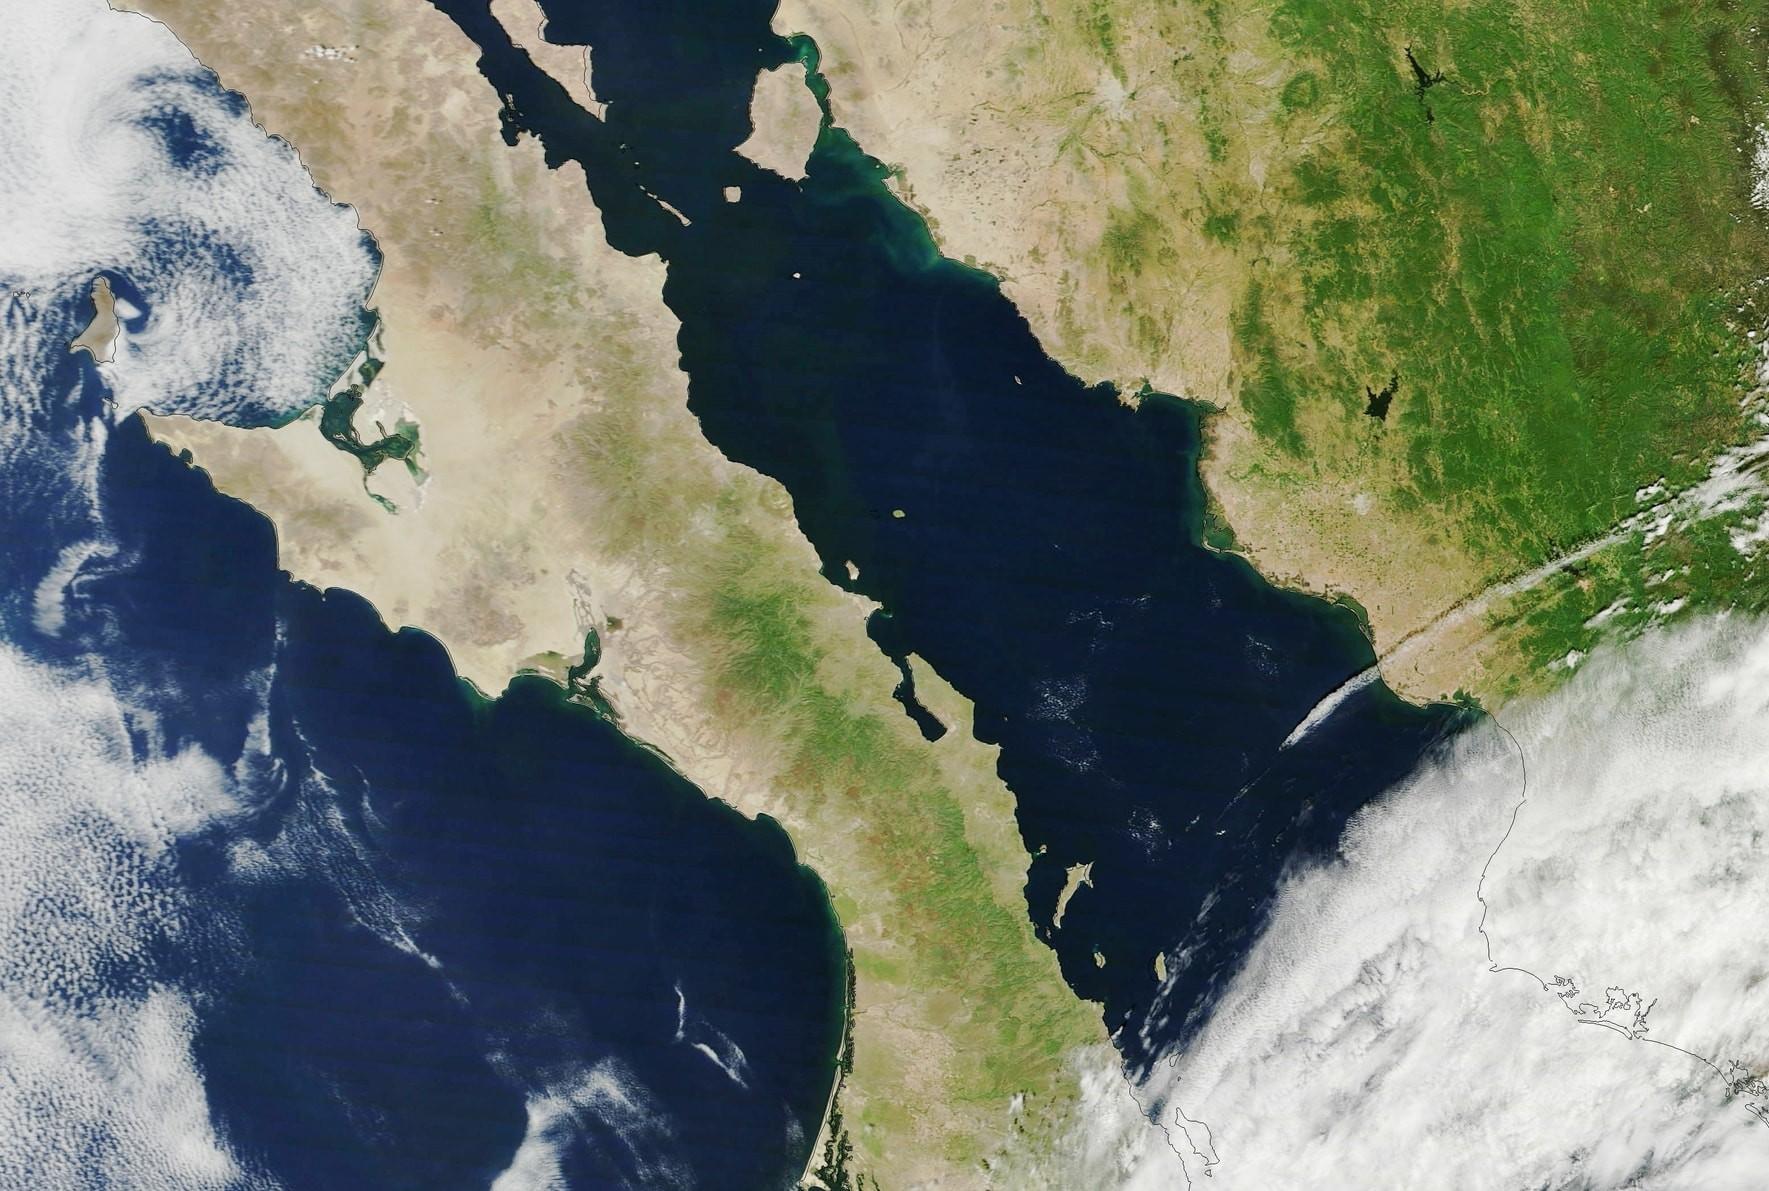 The Baja California Peninsula | © NASA Goddard Space Flight Center / Flickr